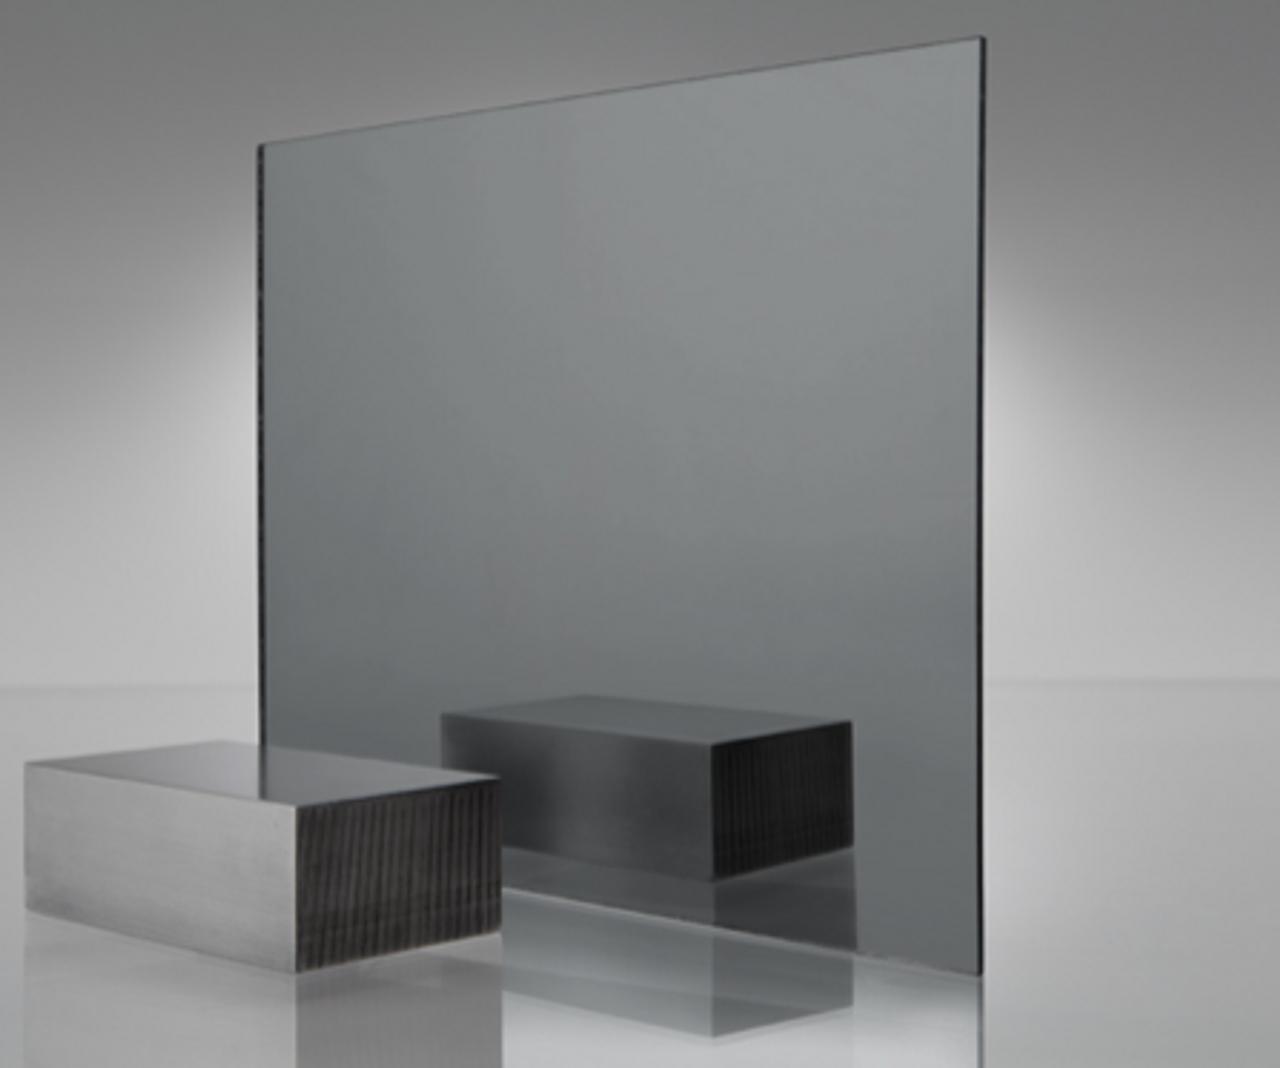 4x8' Mirrored Acrylic GREY SMOKE